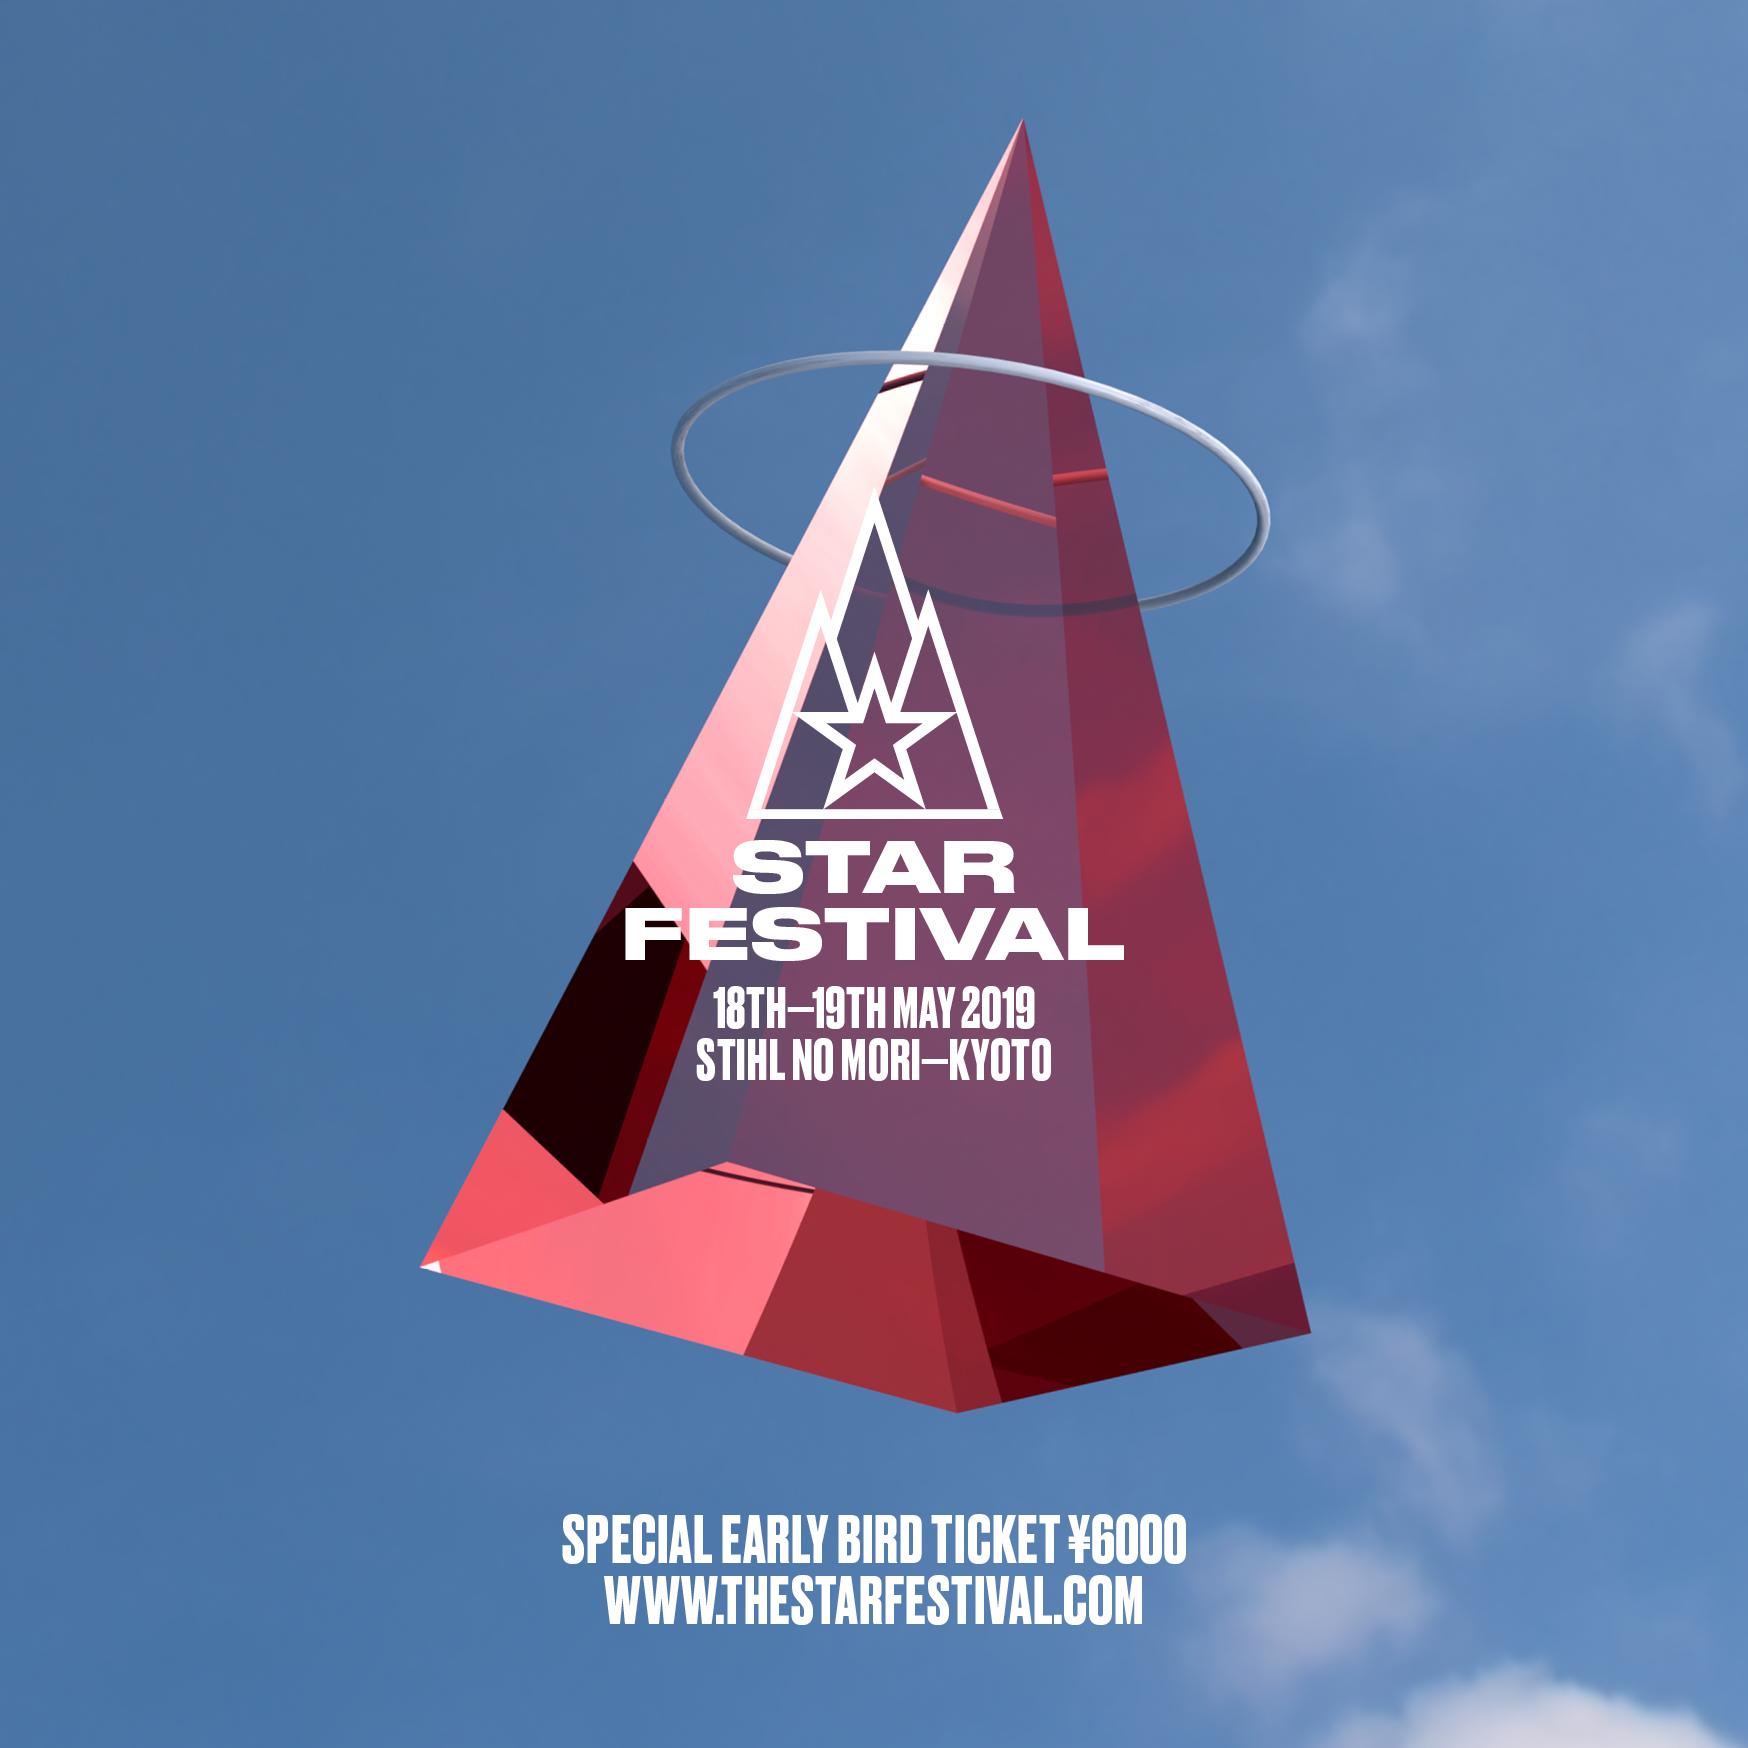 THE STAR FESTIVAL 2019